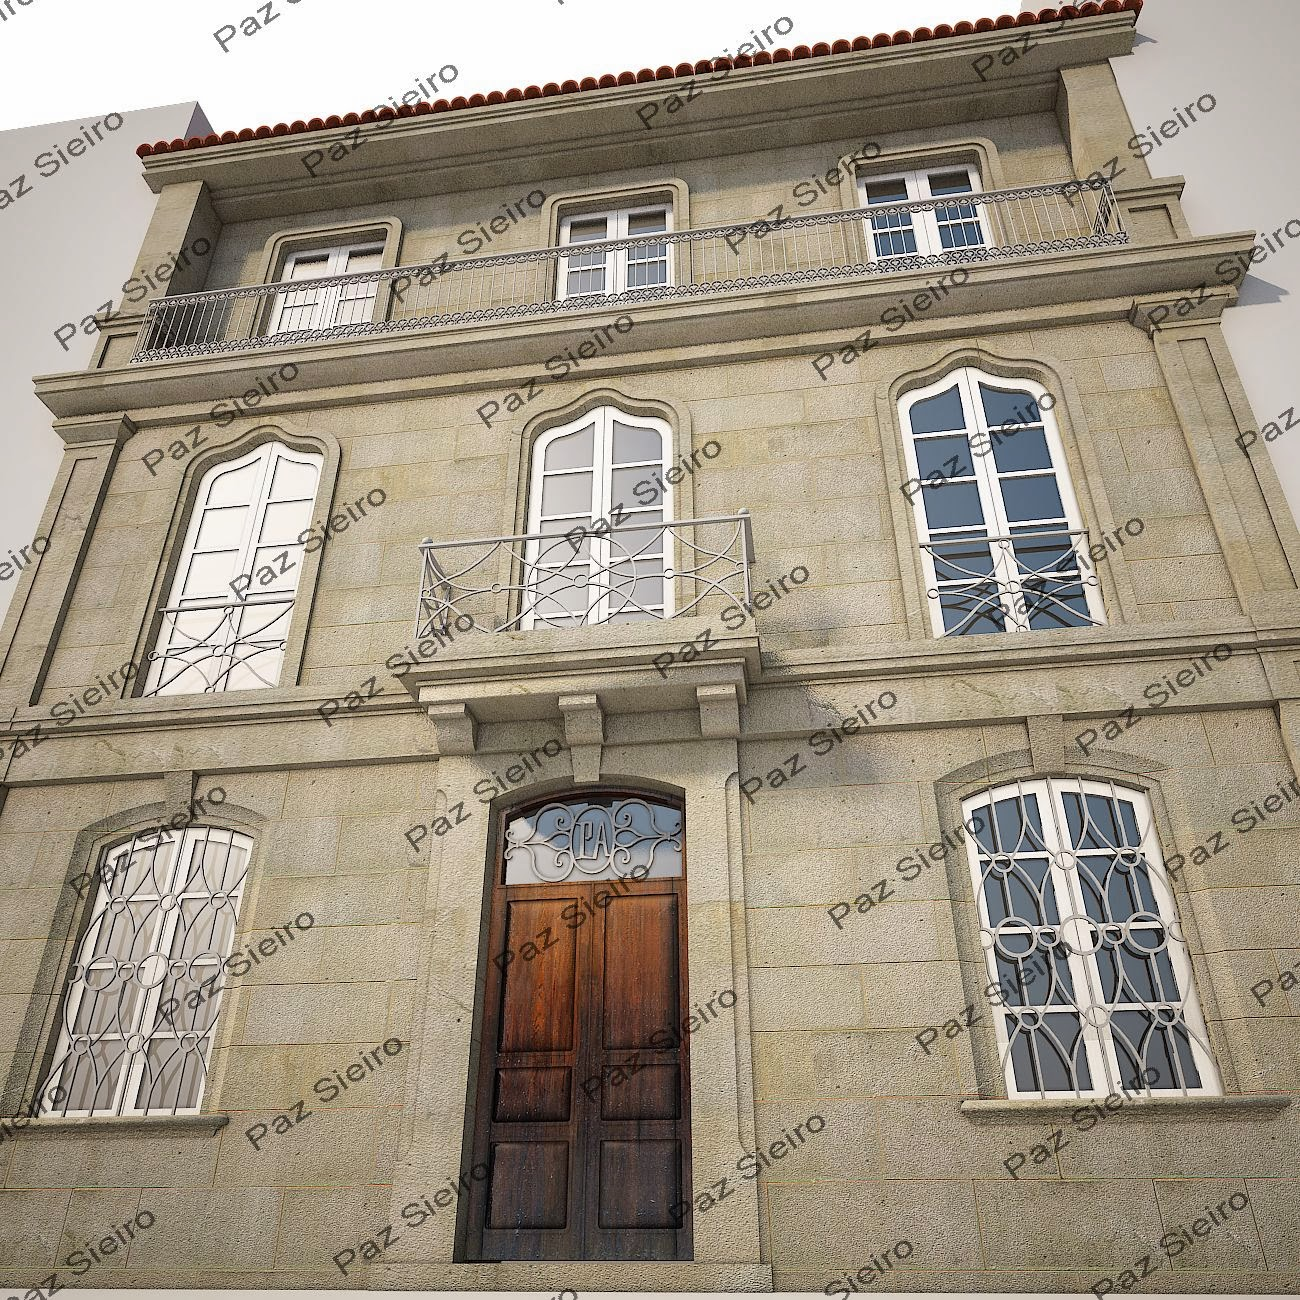 Casa dos paules 1880 r a alva actual cardenal quiroga - Idea casa biancheria mestre ...